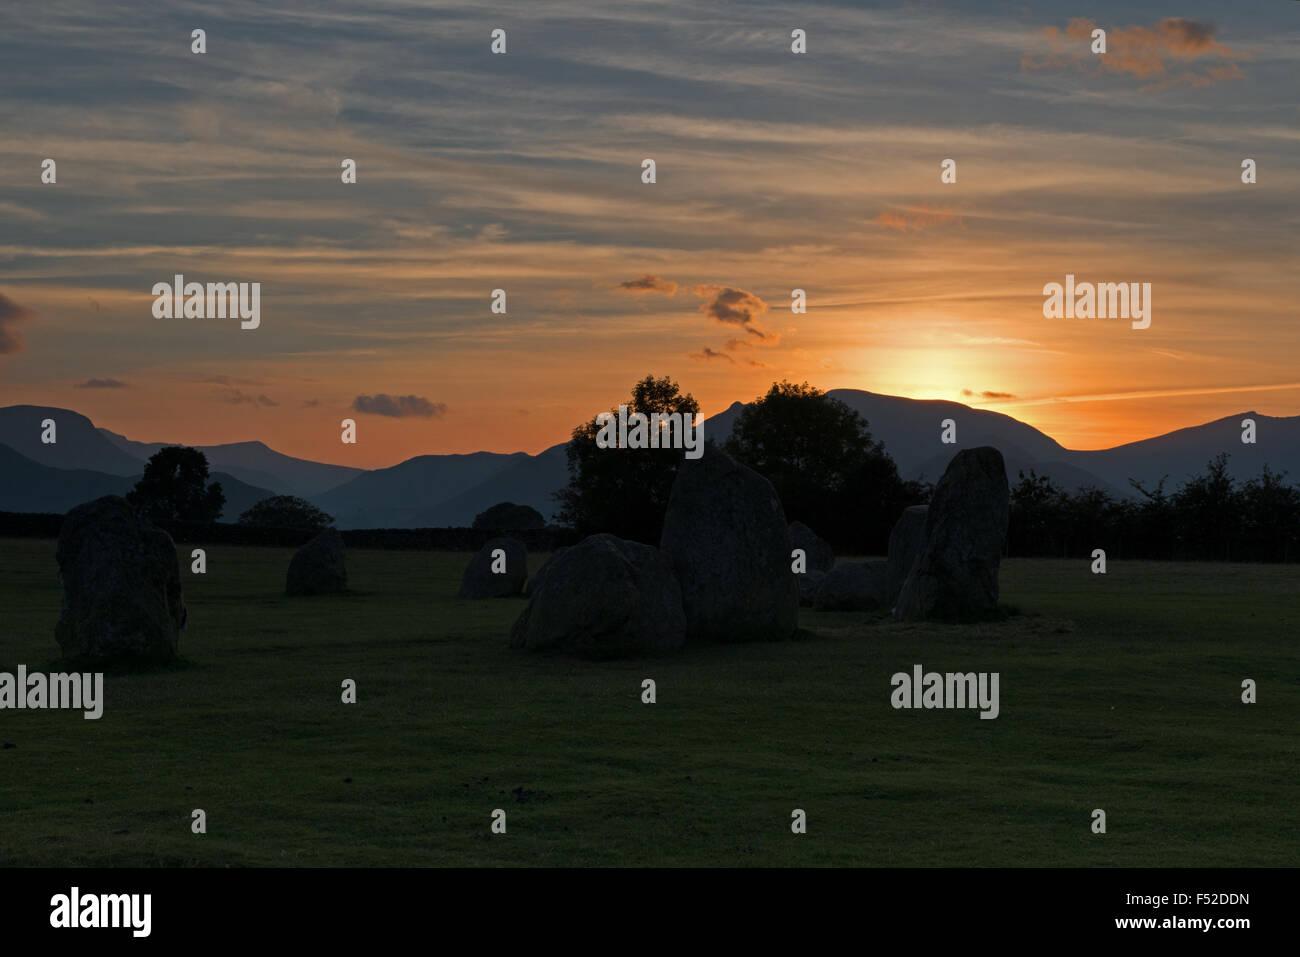 Sunset at Castlerigg stone circle near Keswick, Lake District, Cumbria, England, Uk, Gb - Stock Image